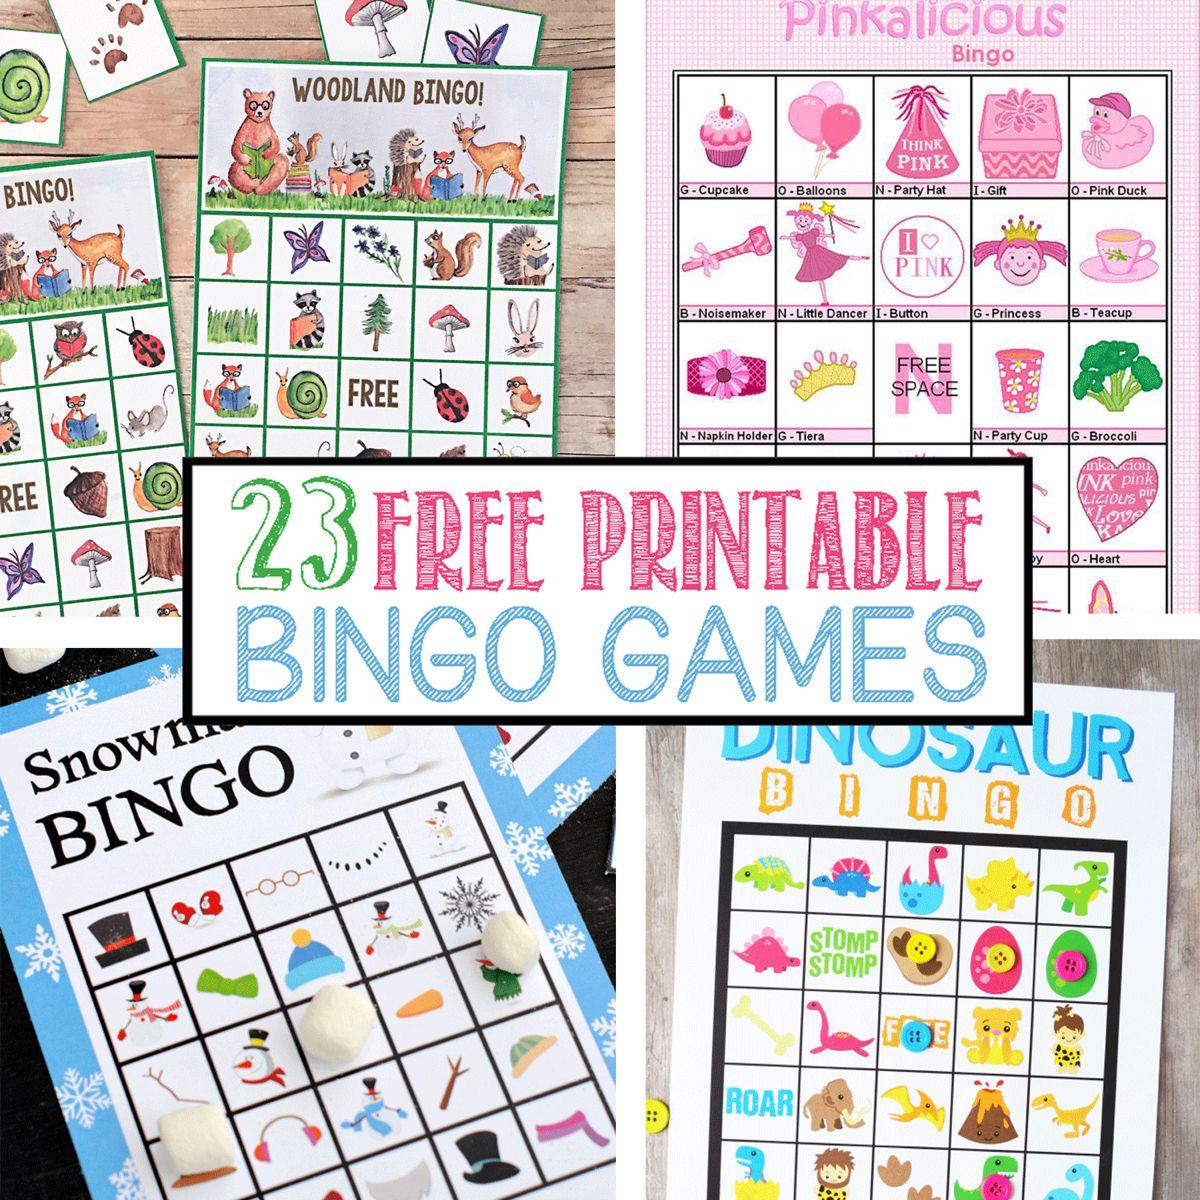 23 Free Printable Bingo Games